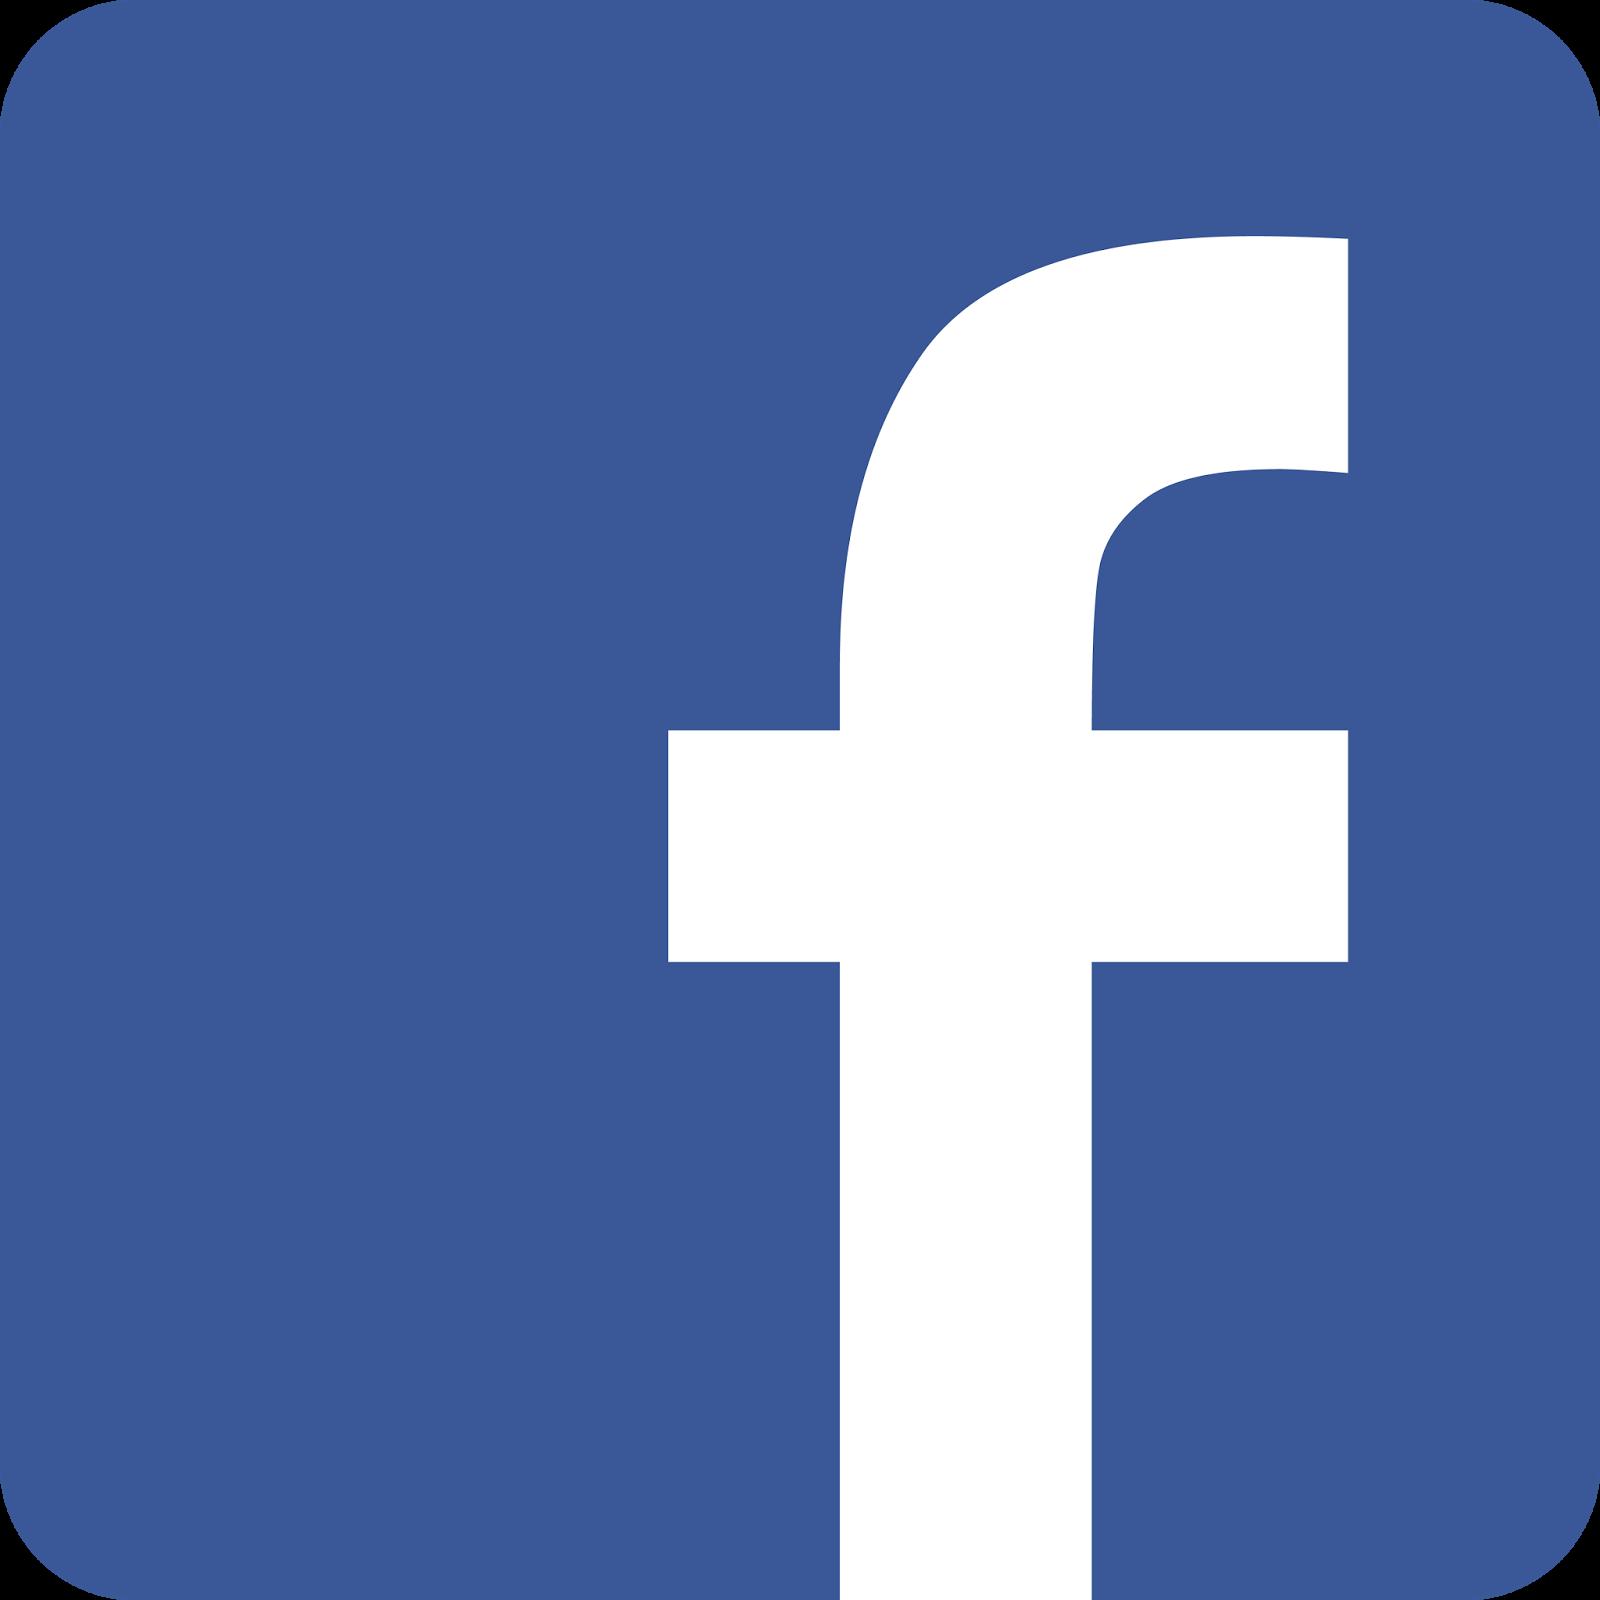 facebook-transparent-logo-png-0 Home